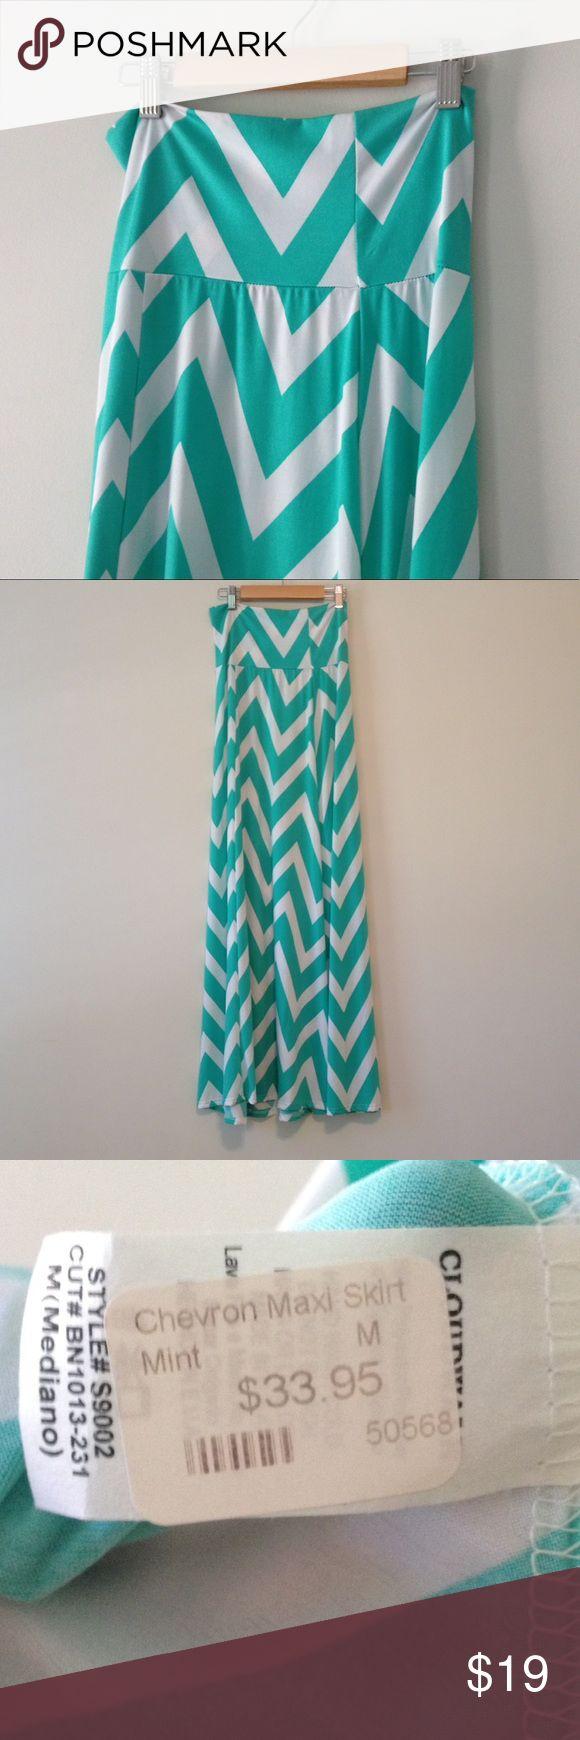 best 25 chevron maxi skirts ideas on pinterest teal